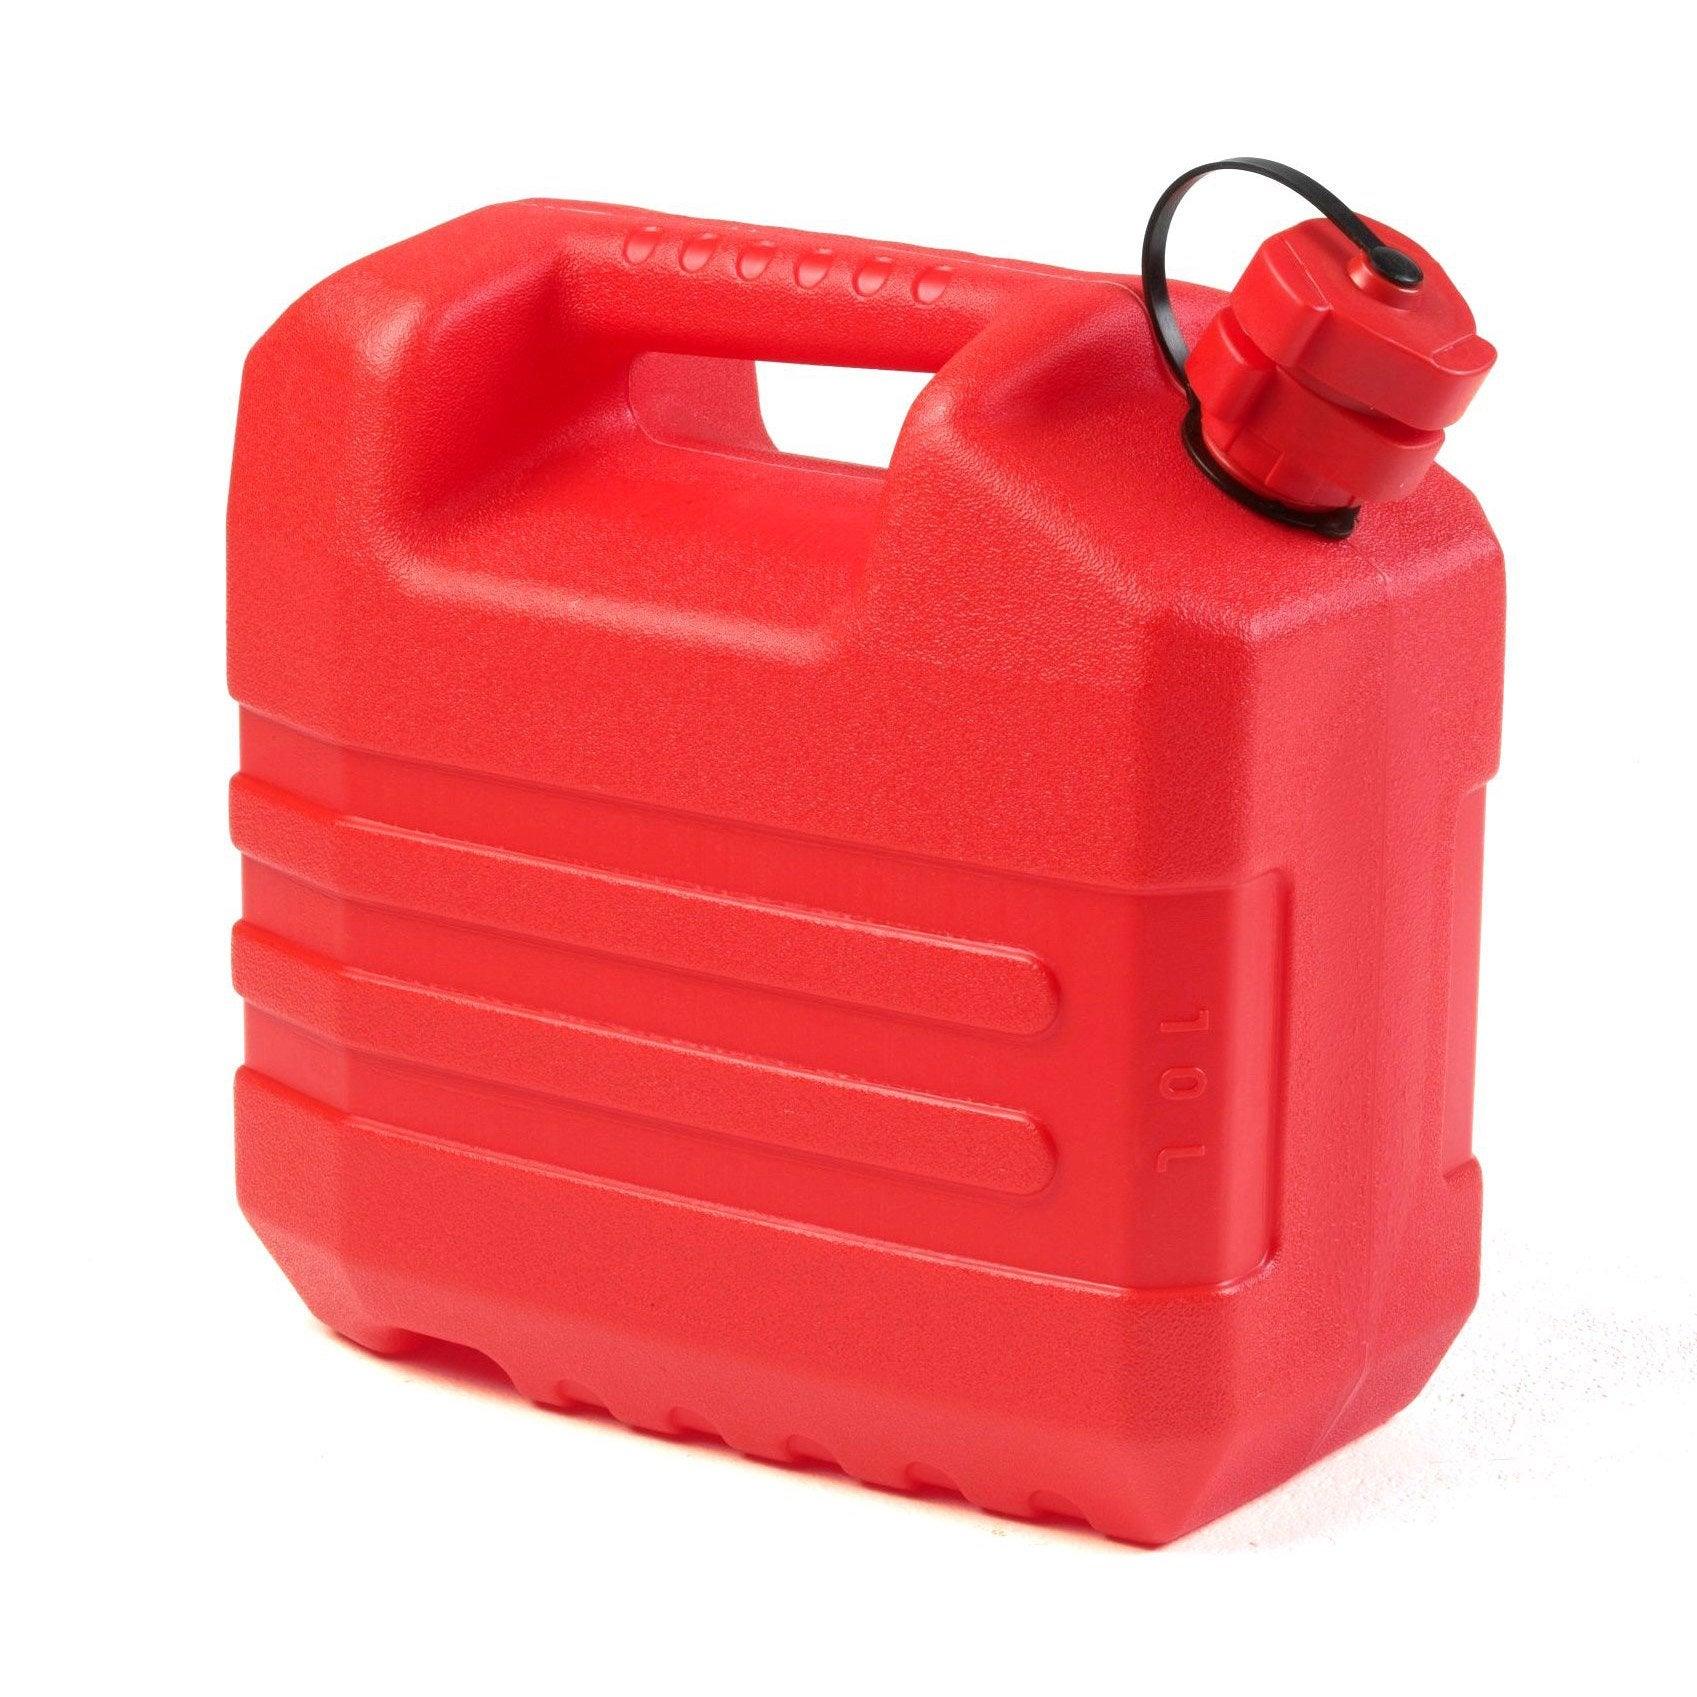 Jerrican En Polyethylene Eda Rouge 20 L Leroy Merlin